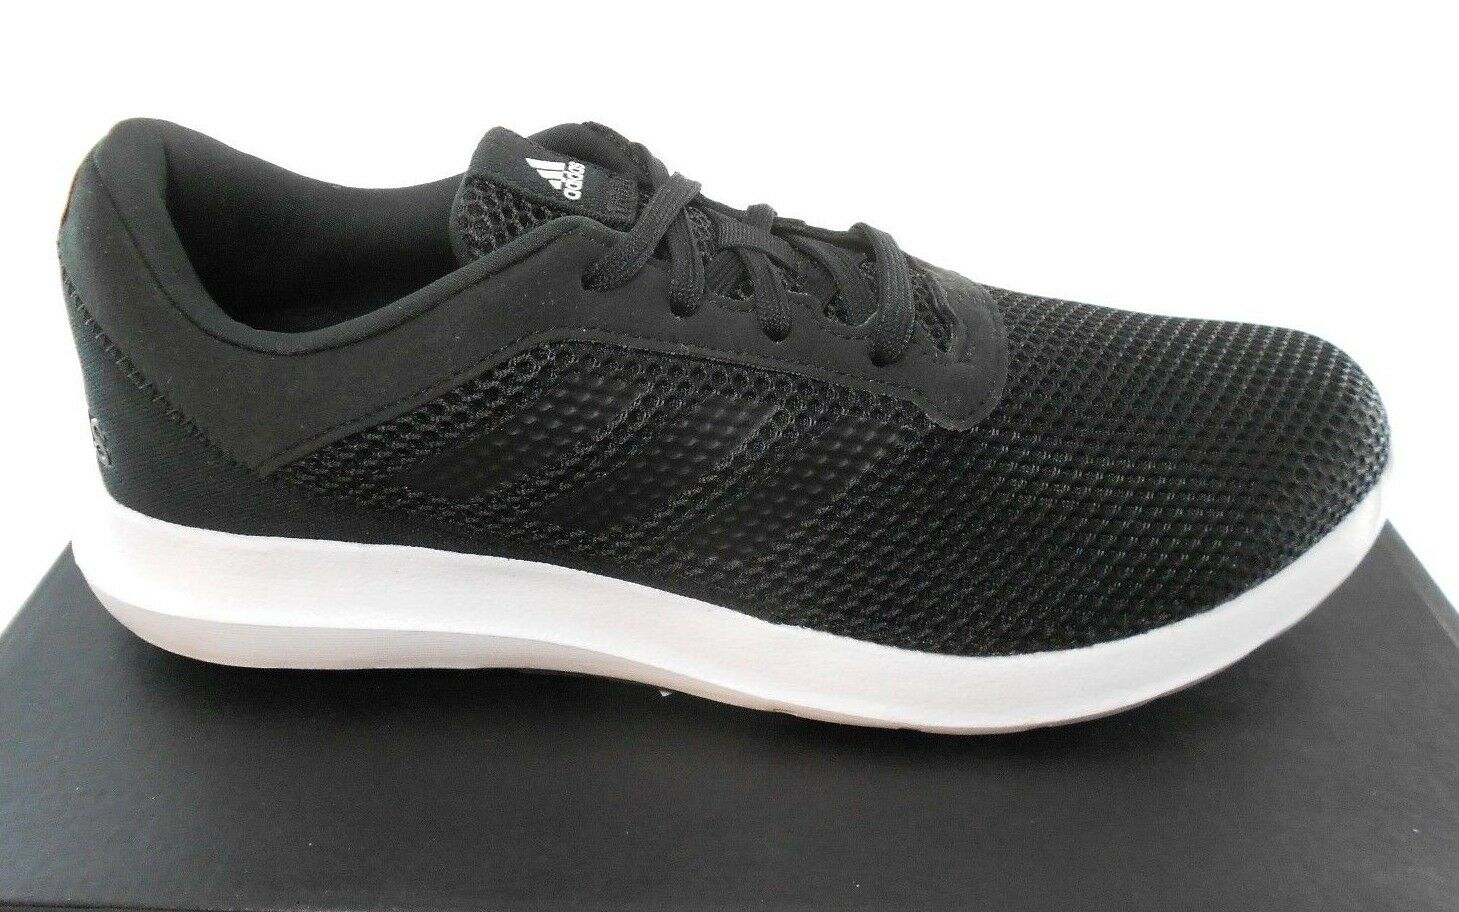 Adidas cloudfoam elemento refrescar 3 m running hombres negro / blanco running m zapatos, # bb3599 a8c77e